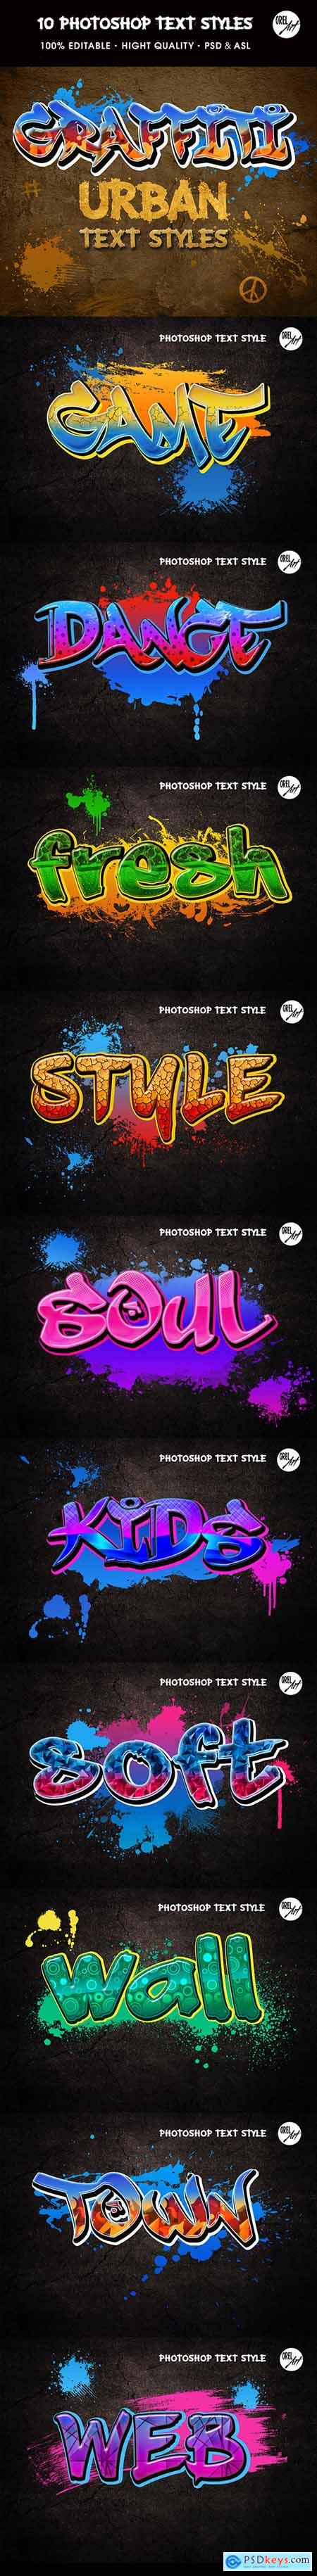 Graffiti Text Styles 30361952